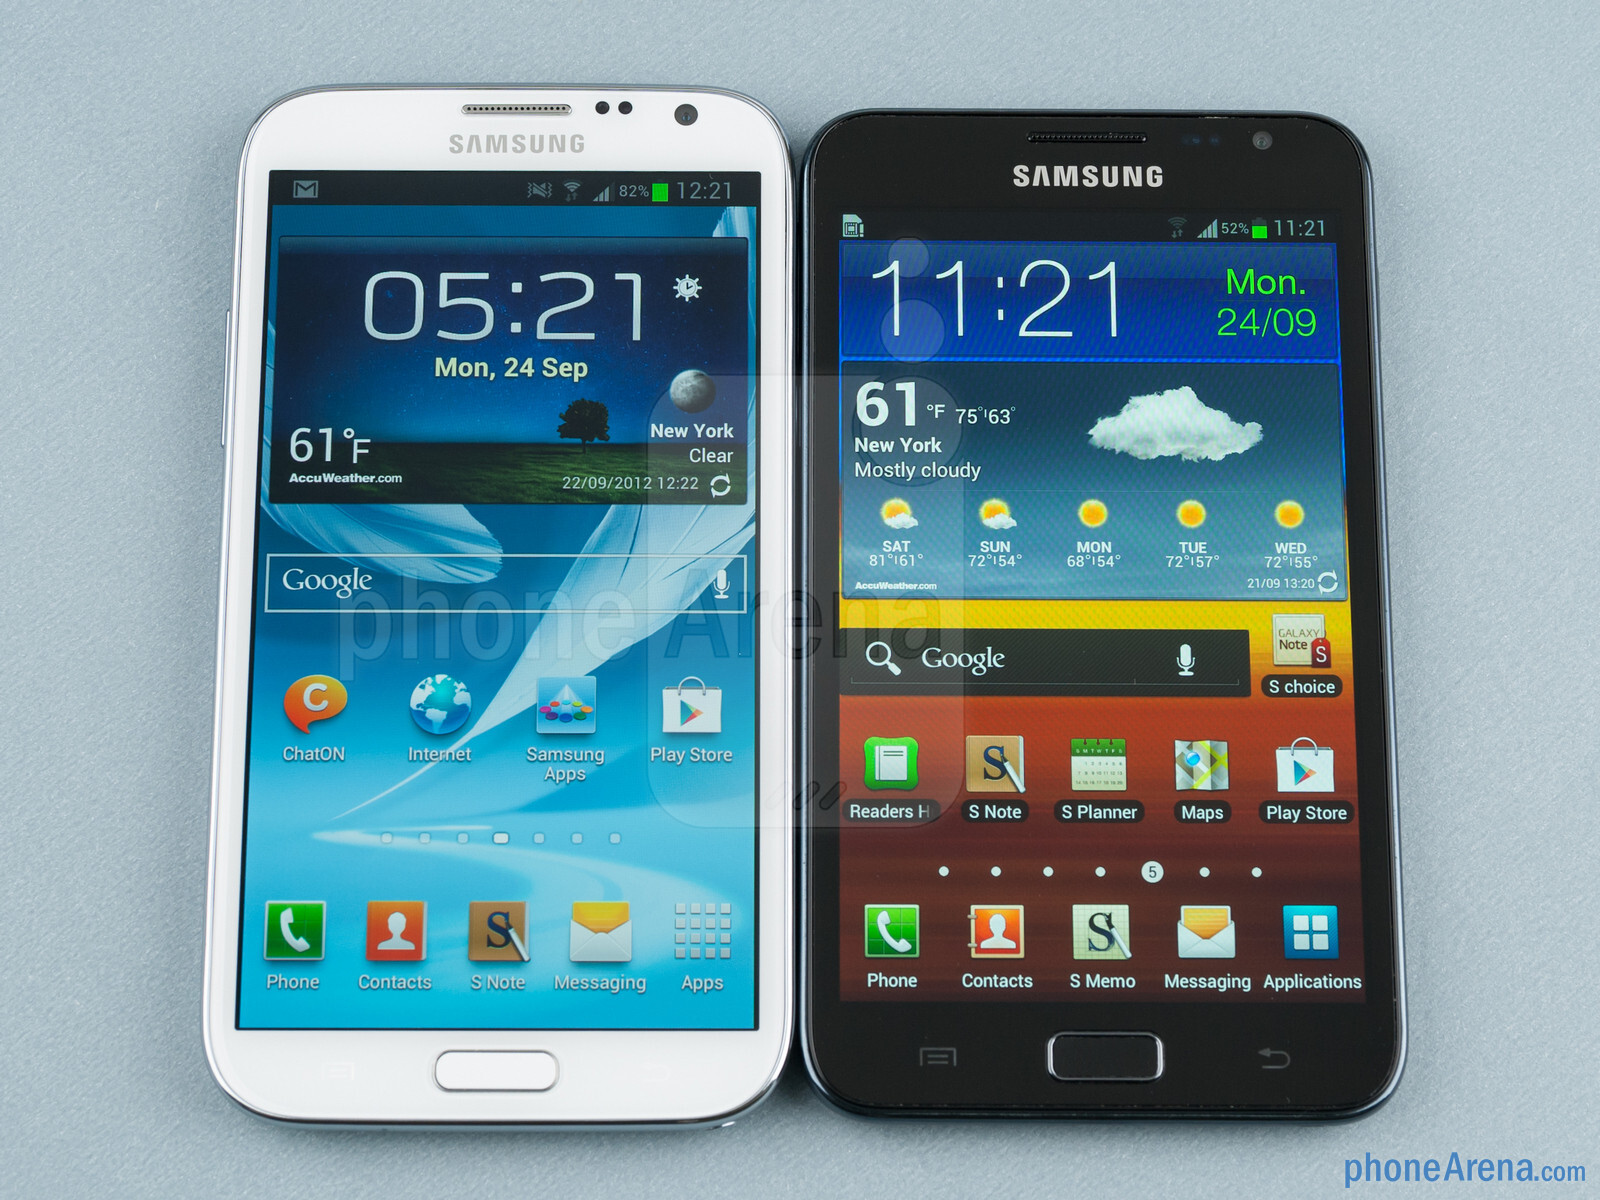 Samsung Galaxy Note (right) - Samsung Galaxy Note II vs Galaxy Note